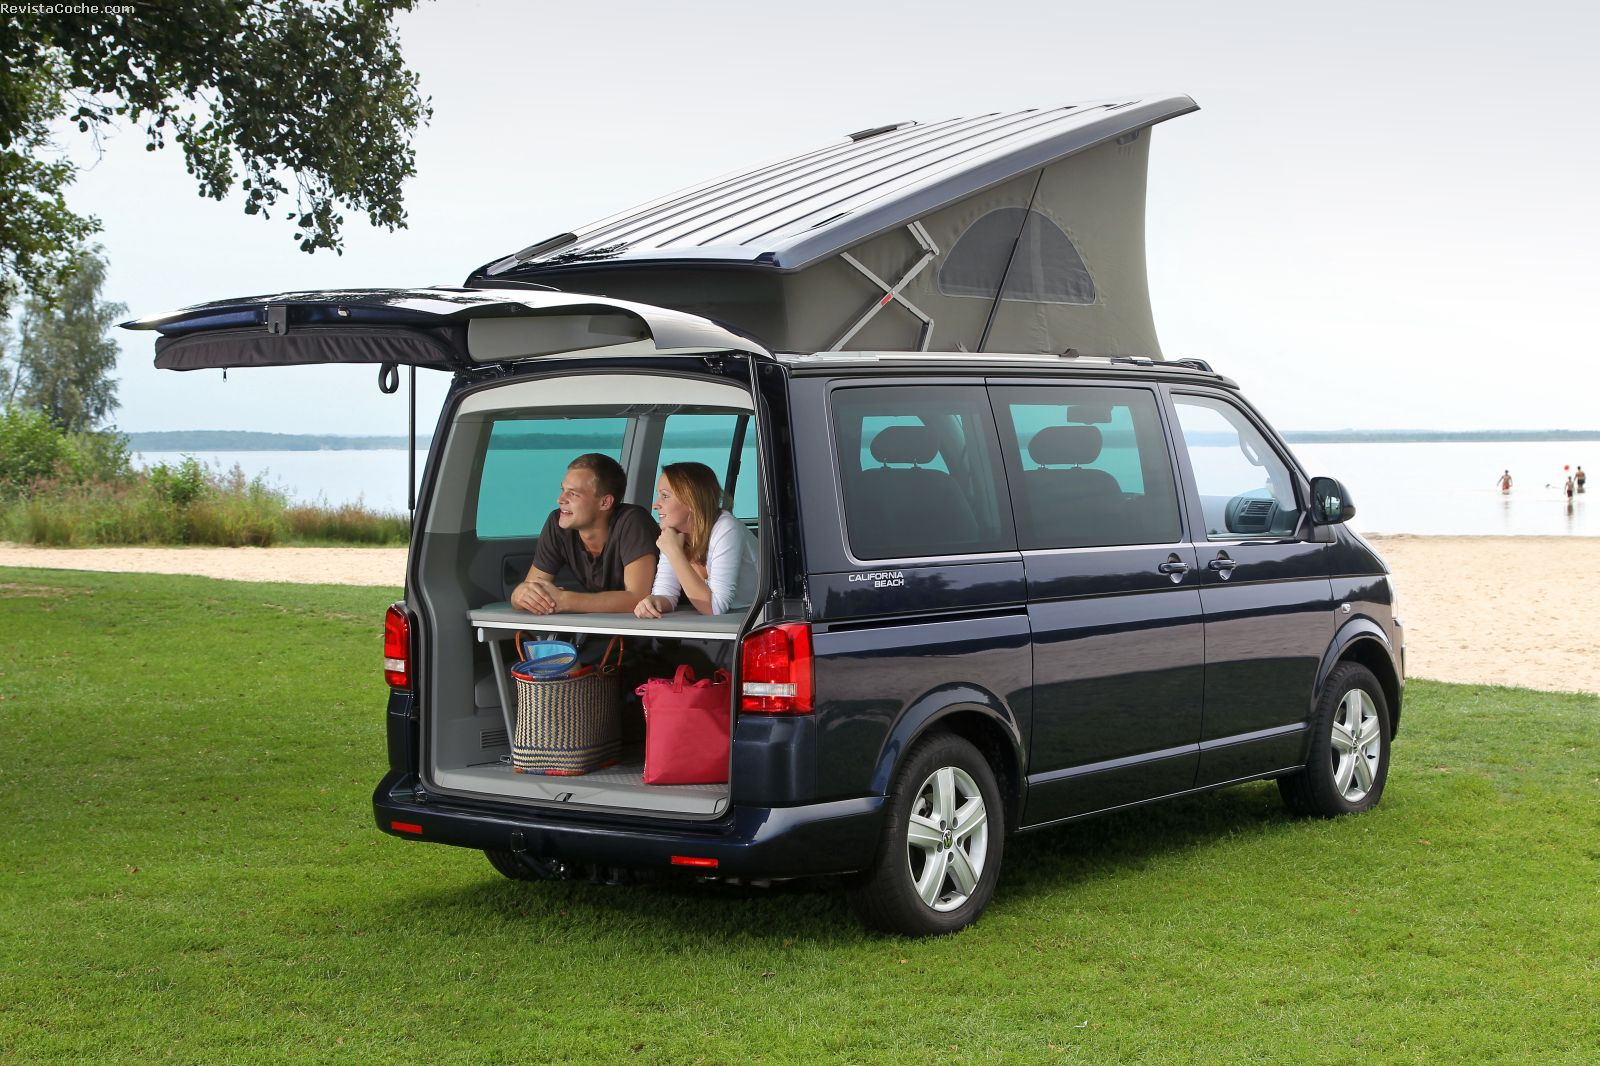 revista coche 25 a os del volkswagen california. Black Bedroom Furniture Sets. Home Design Ideas